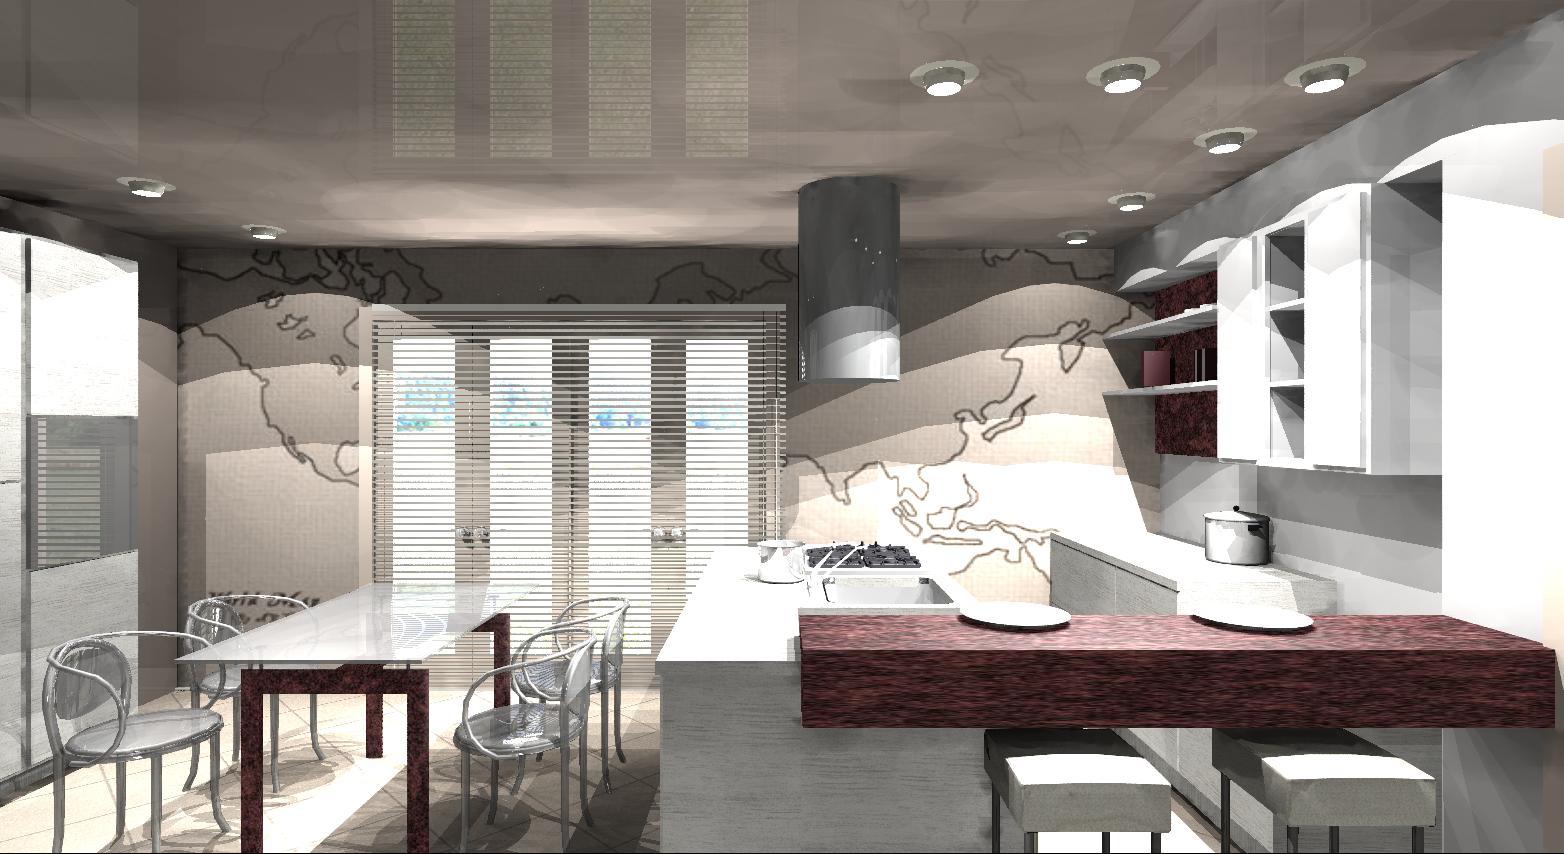 Isola cucina con tavolo gallery of cucina con isola cucina in stile in stile moderno di nadia - Cucina open space con isola ...